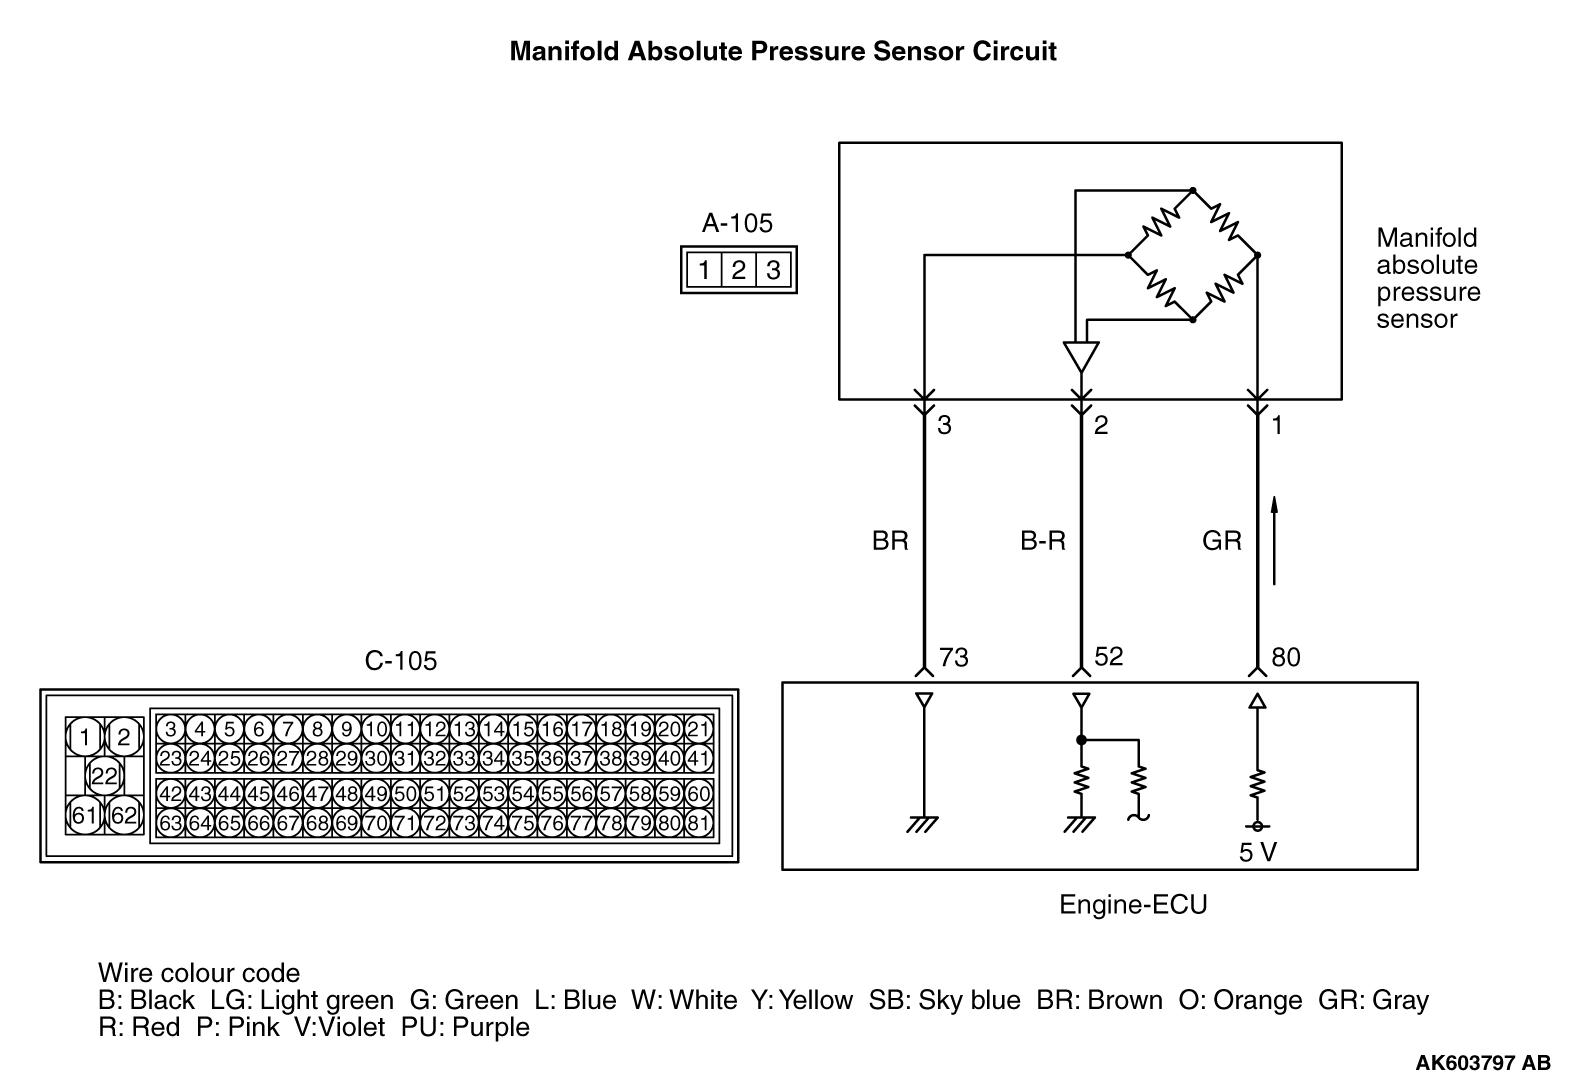 Snap Air Pressure Sensor Circuit Diagram And Schematics Temperature Indicator Sensorcircuit Seekiccom